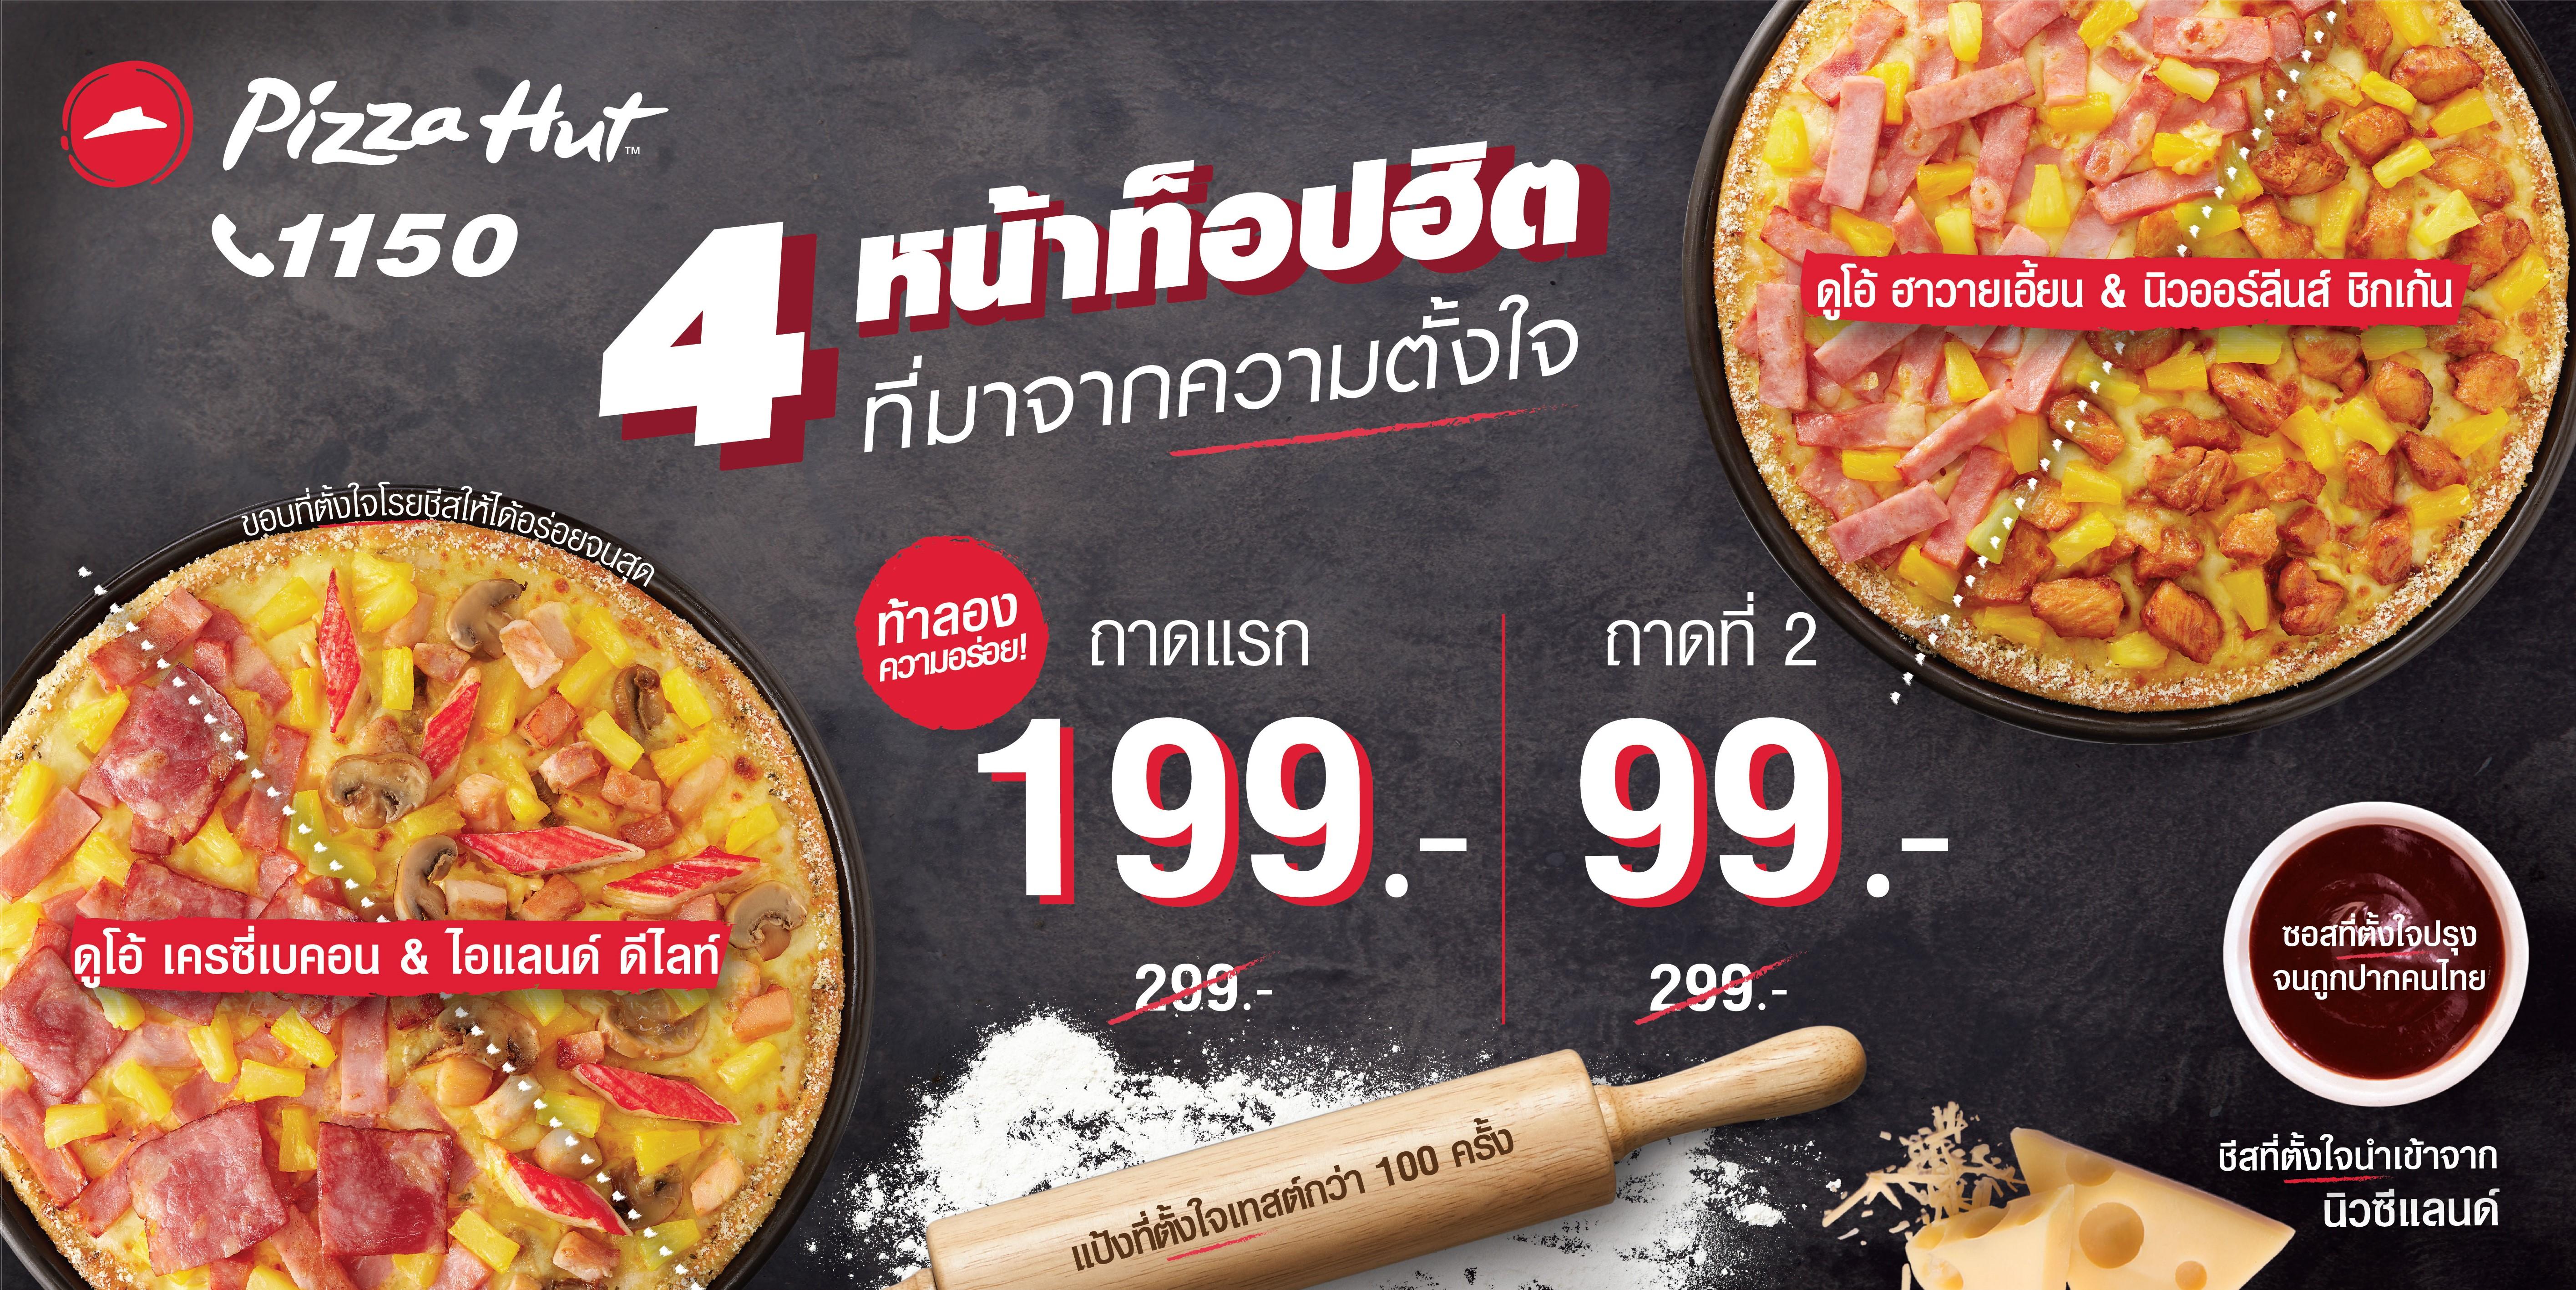 AW pizzahut 1x2 M-01